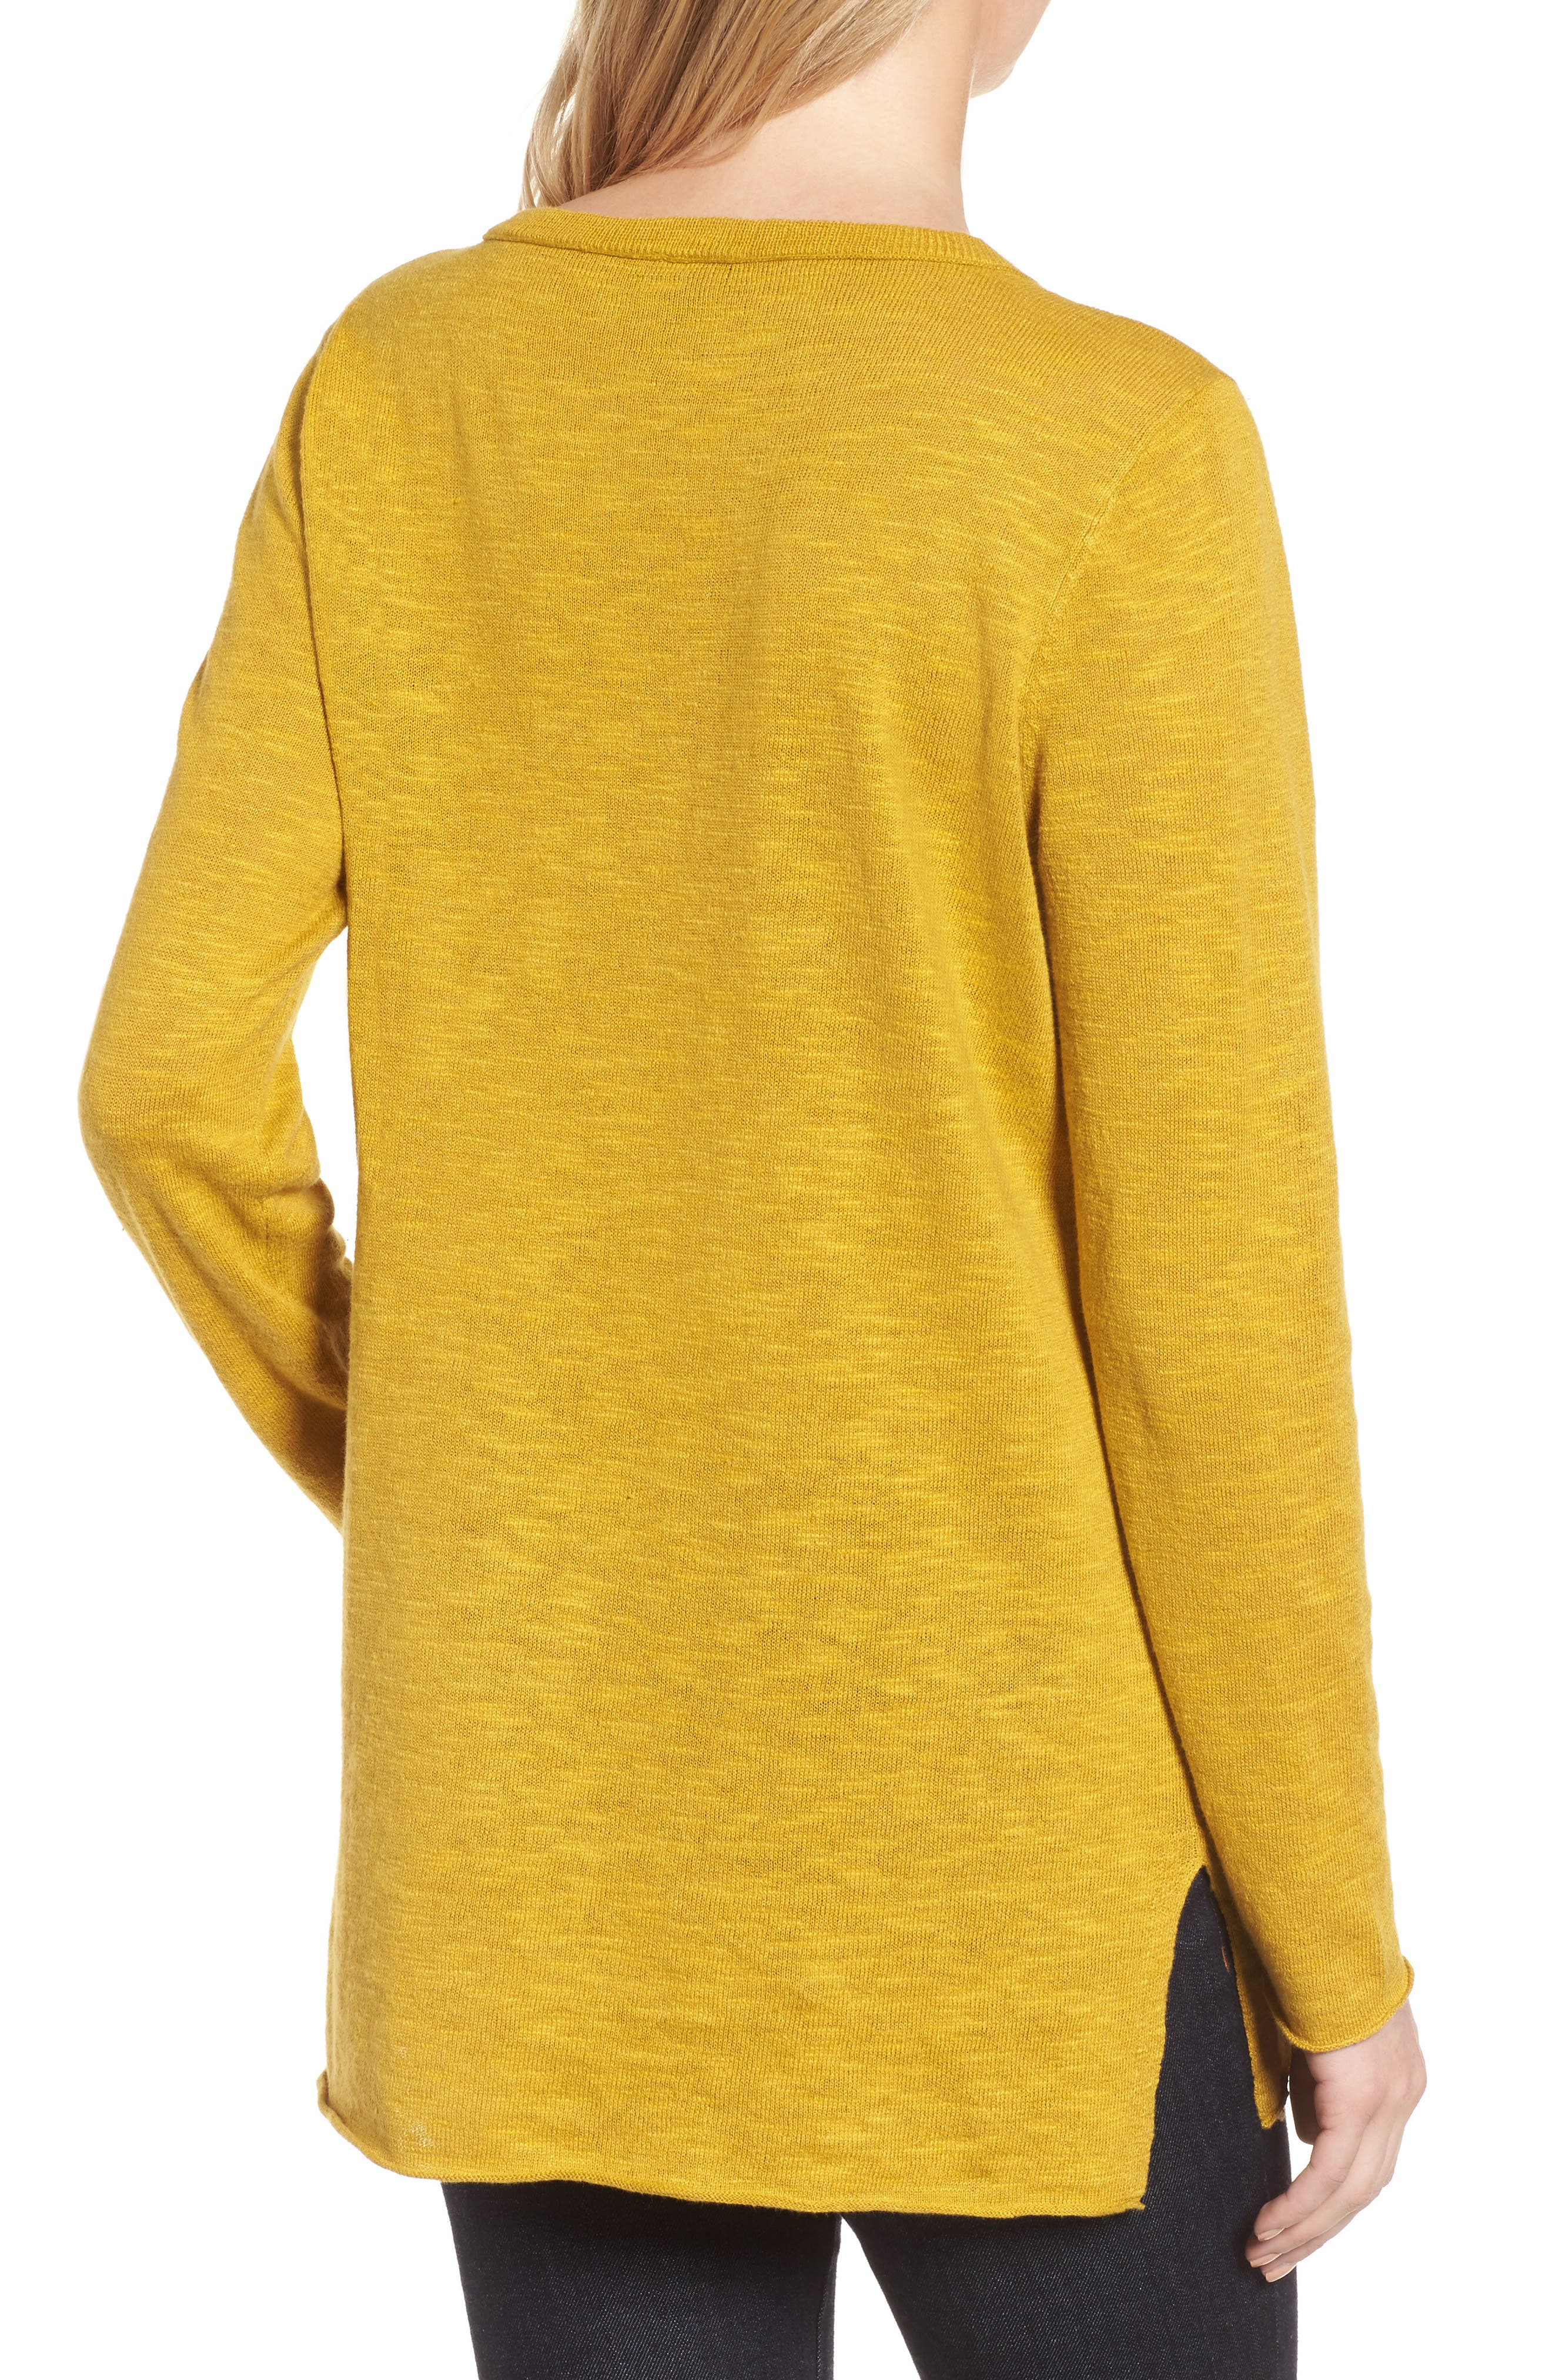 Organic Knit Crewneck Tunic Top,                             Alternate thumbnail 2, color,